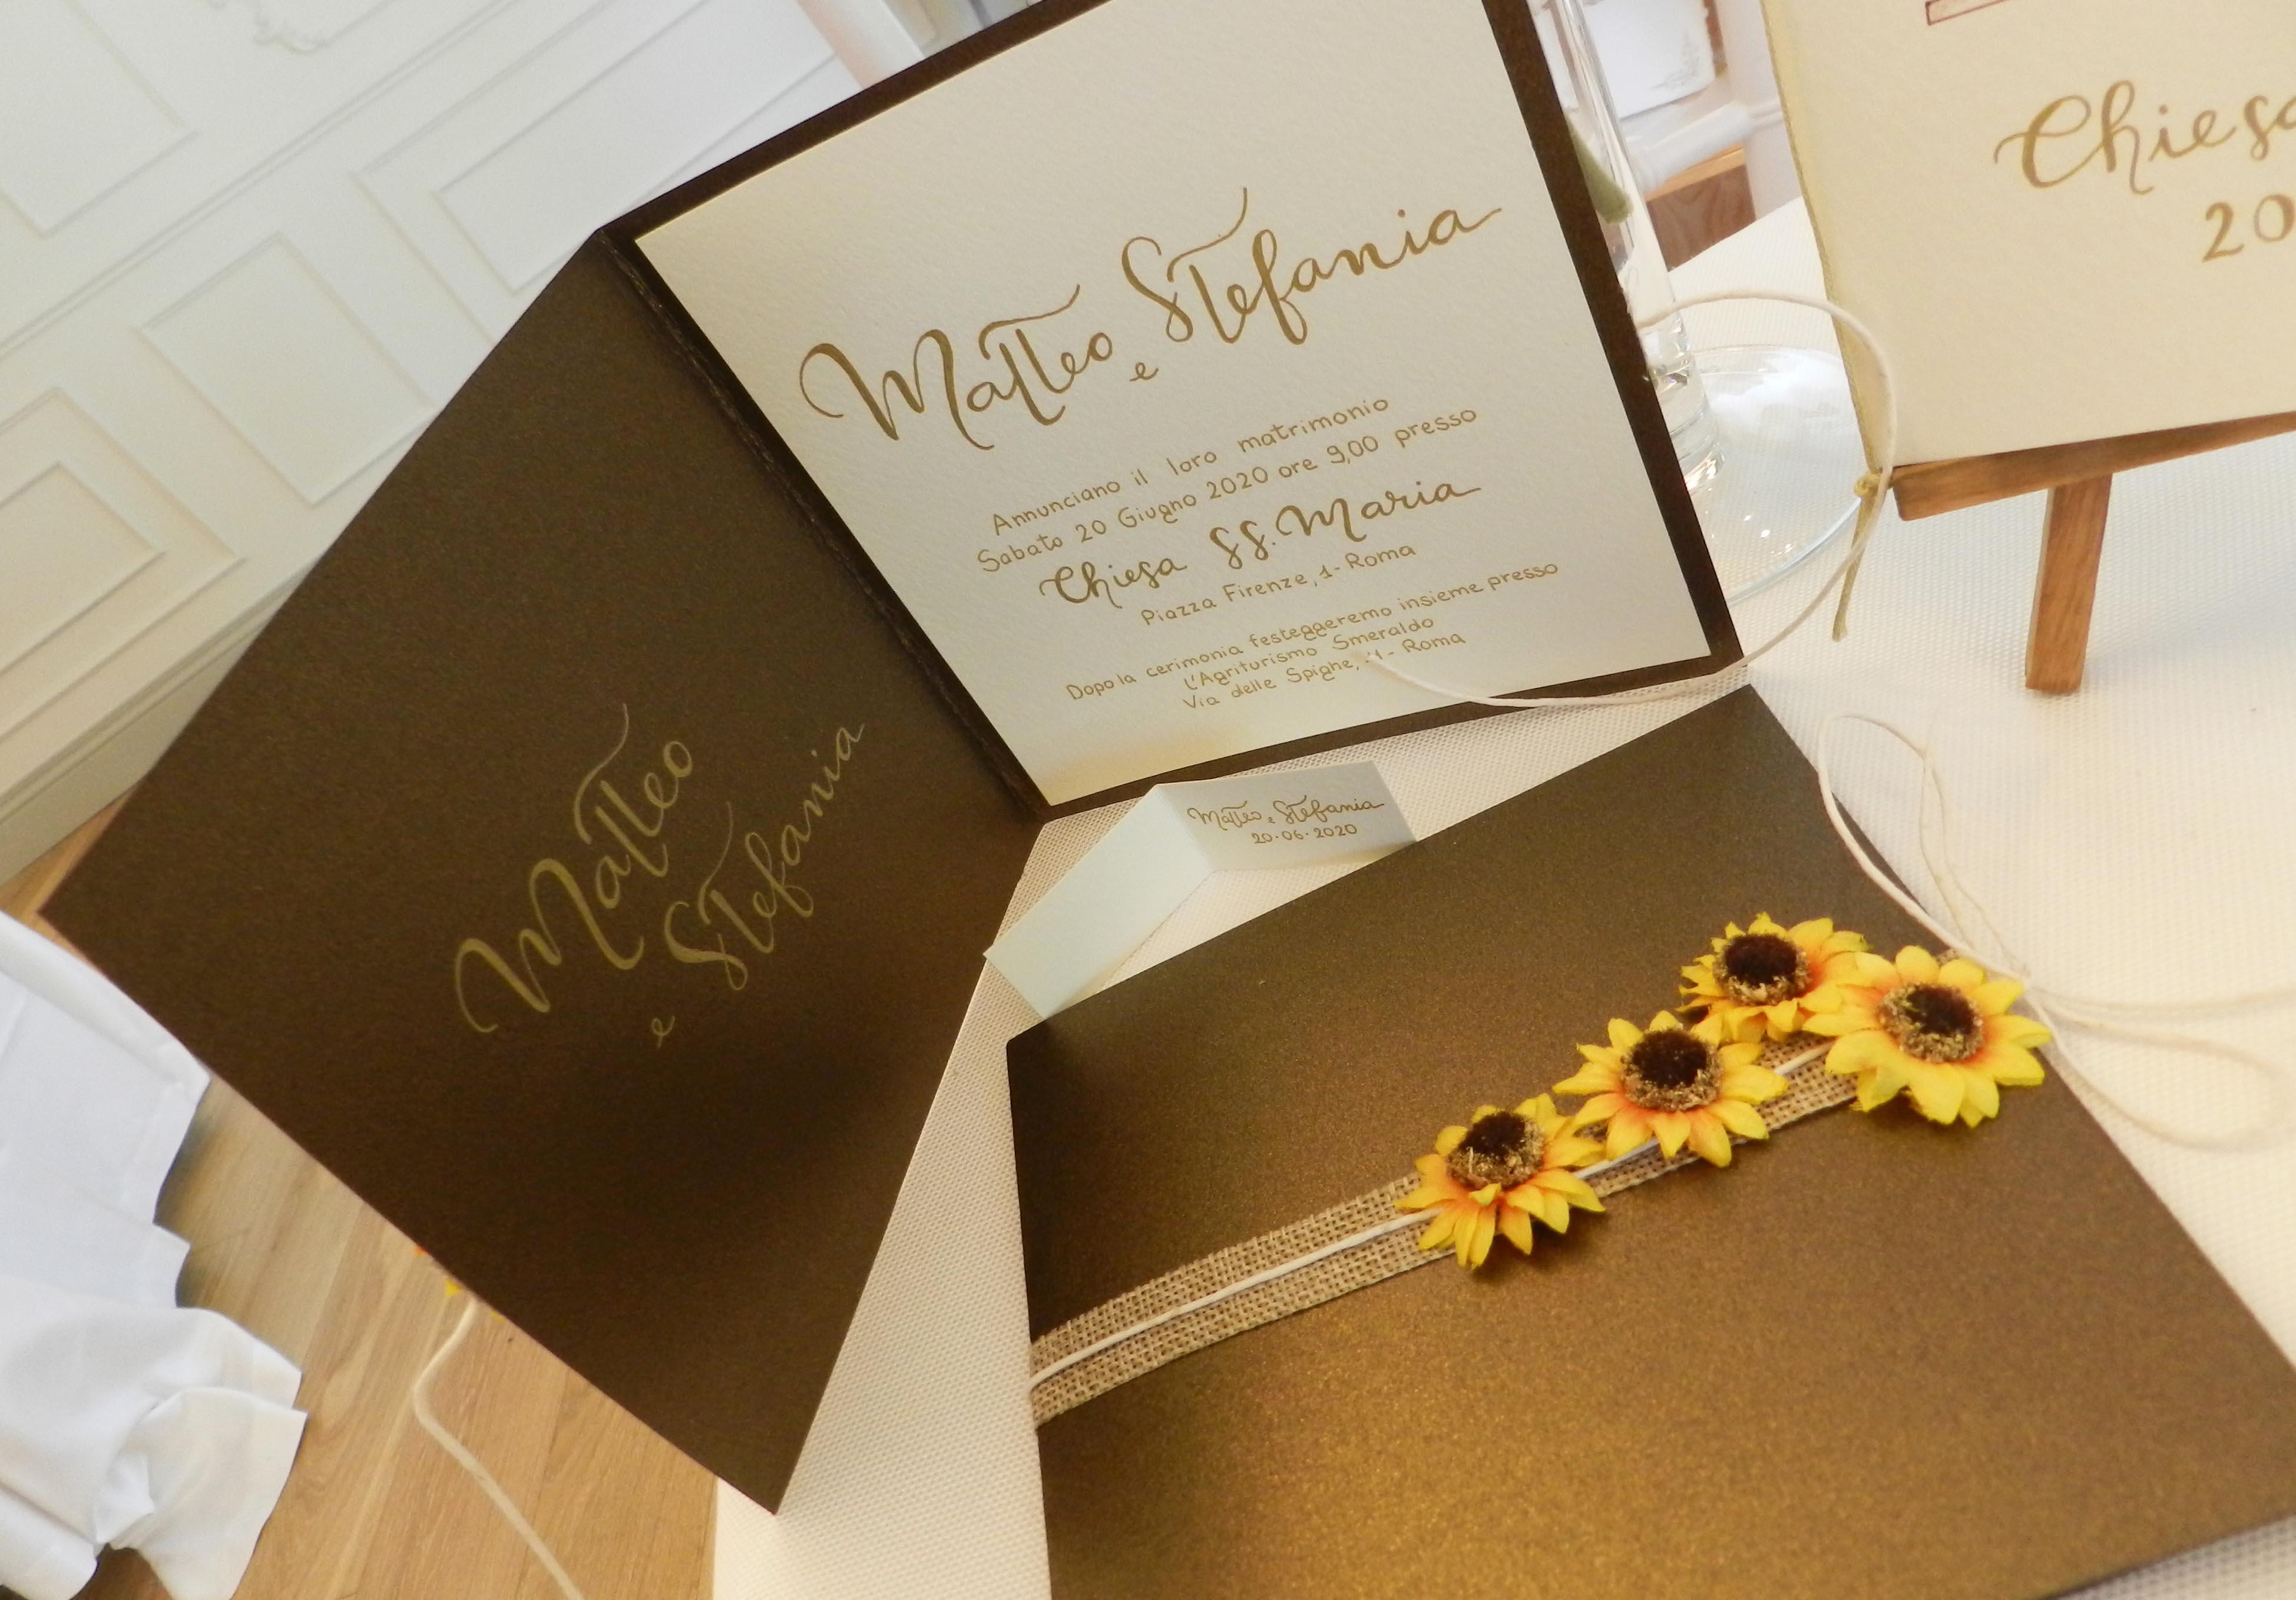 Inviti Matrimonio Girasoli : I girasoli lagigroup tipografia e stampa digitale online